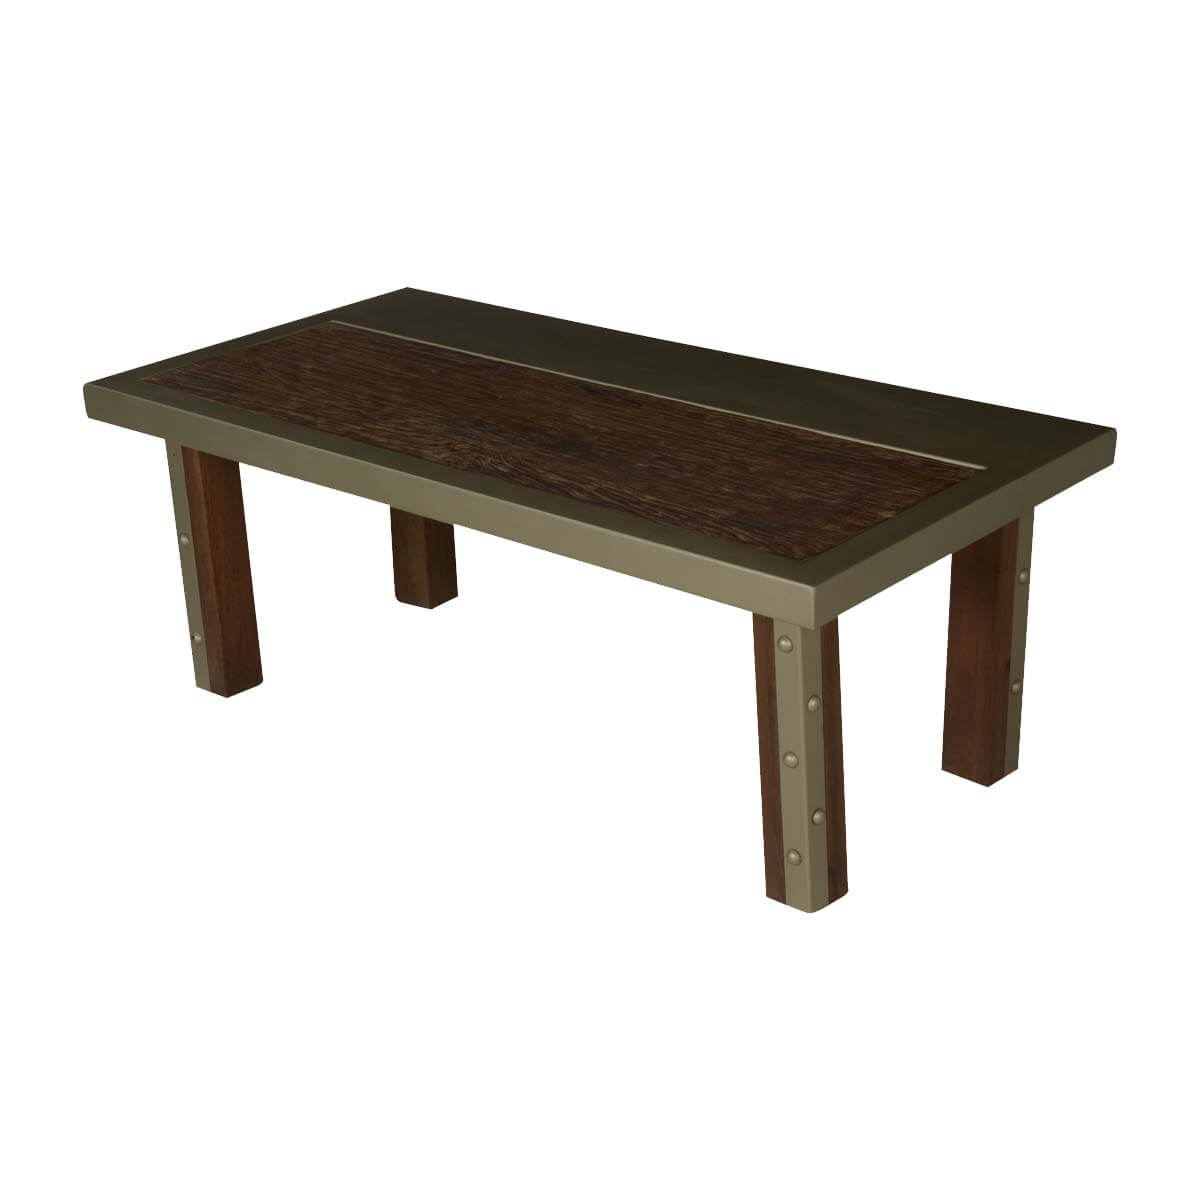 "Modern Industrial Mango Wood & Iron 47"" Coffee Table"